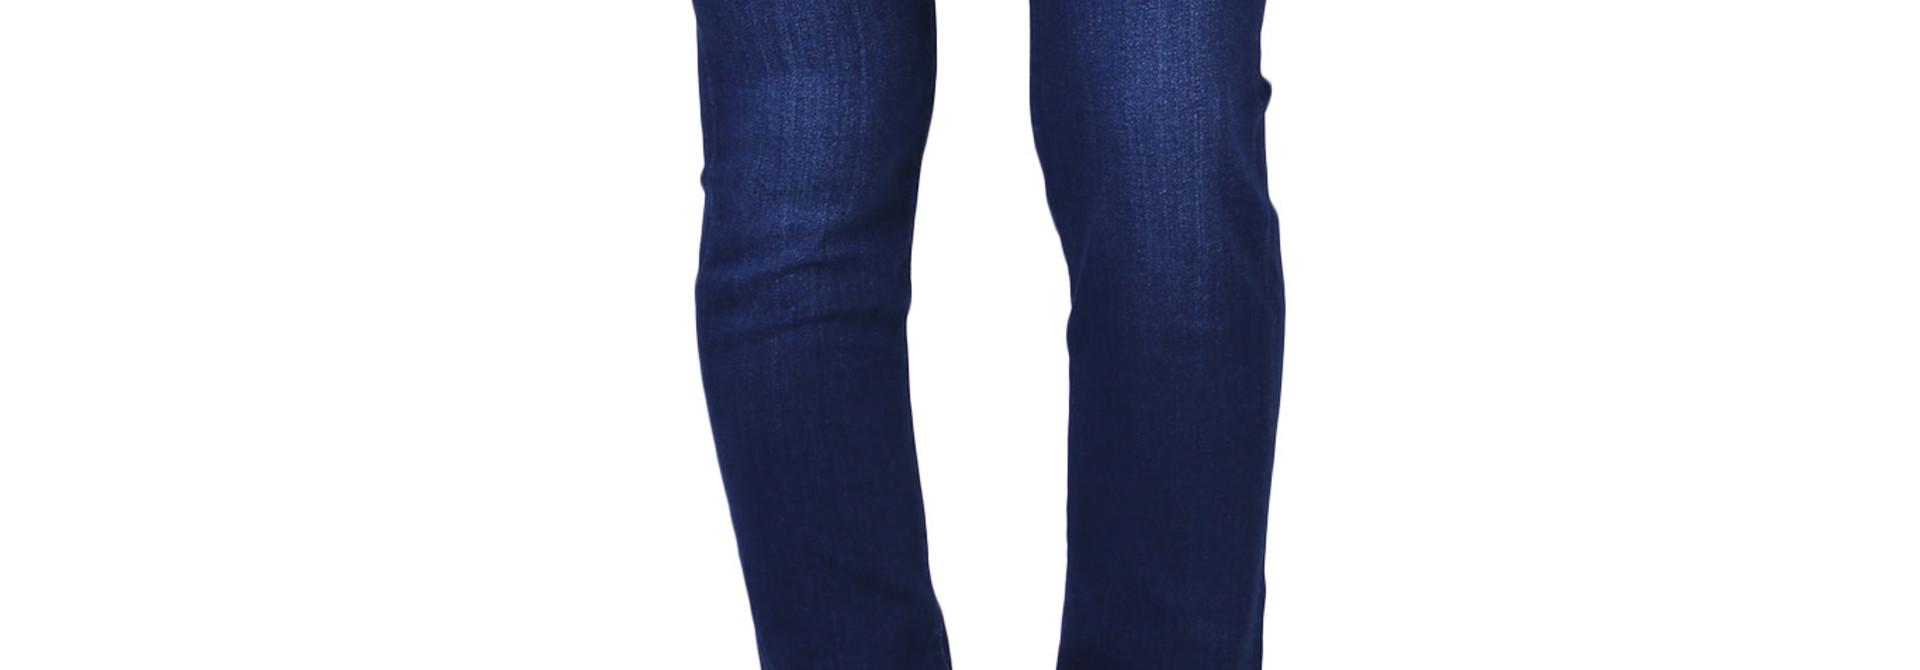 Jeans 7 For All Mankind PYPER Slim Illusion Homeland